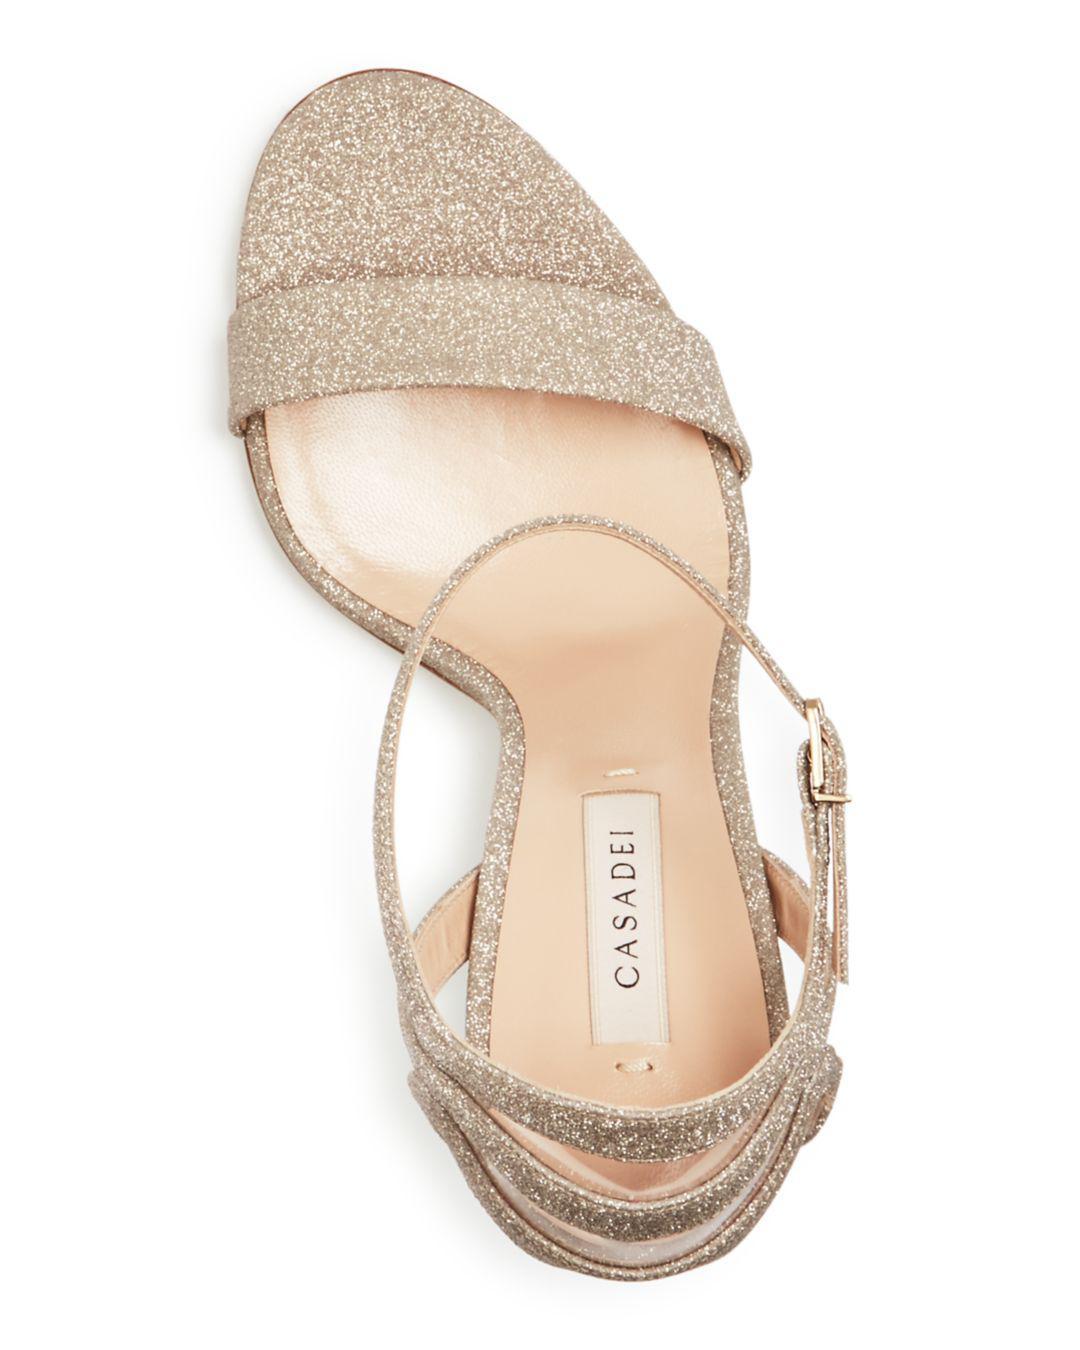 27bc76c49d2 Casadei - Multicolor Women s Glitter Ankle-strap High-heel Sandals - Lyst.  View fullscreen